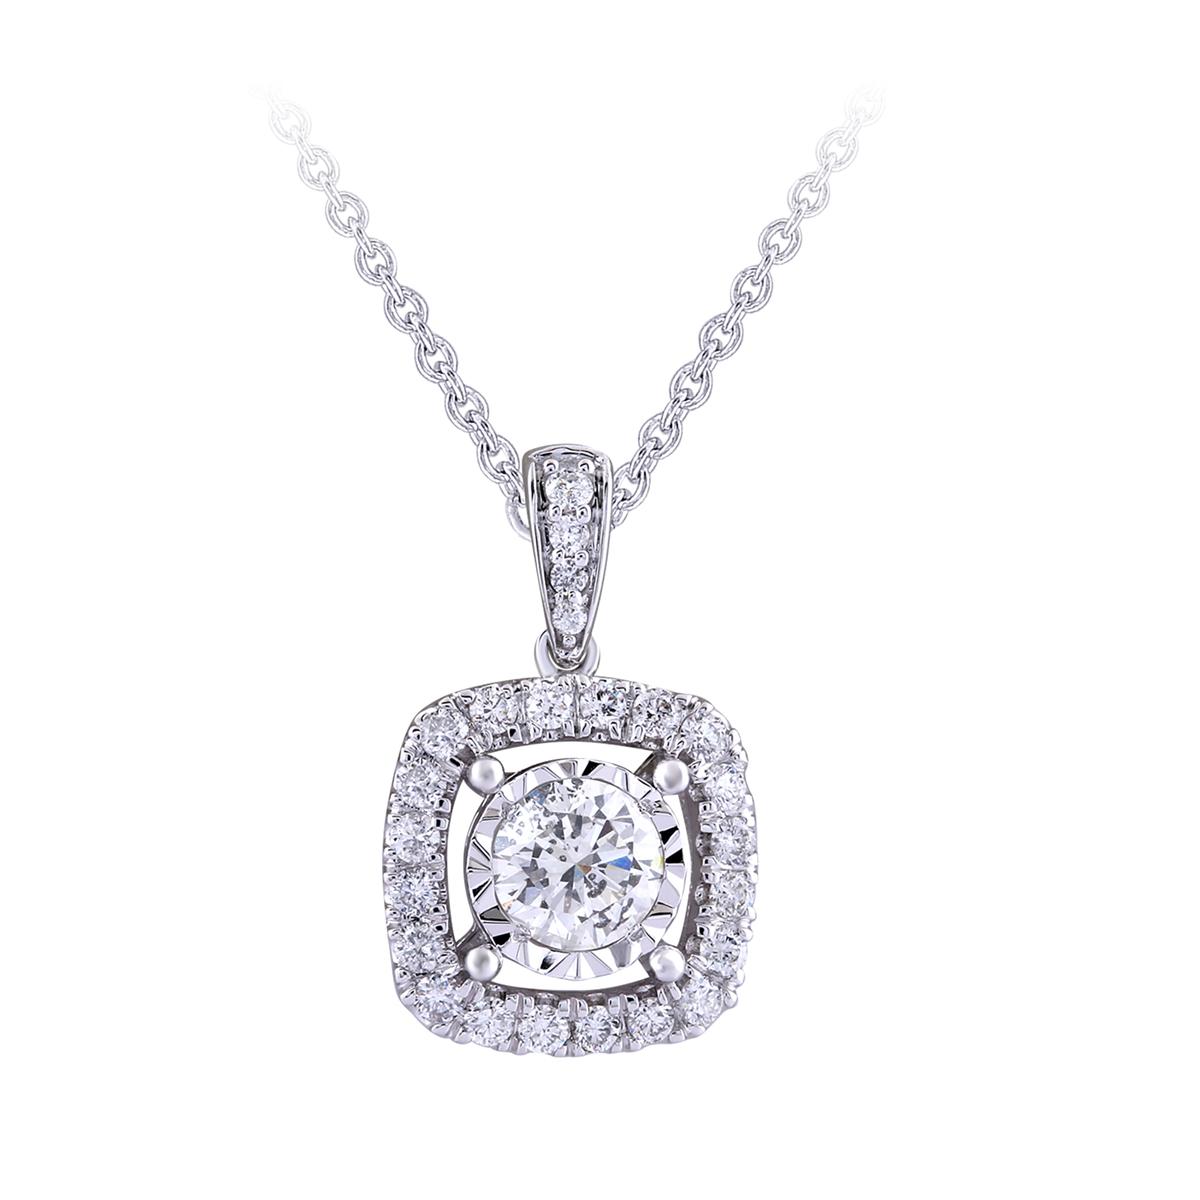 Paramount Gems 14 Karat White Gold Round .75 Carat Diamond Halo Pendant Necklace